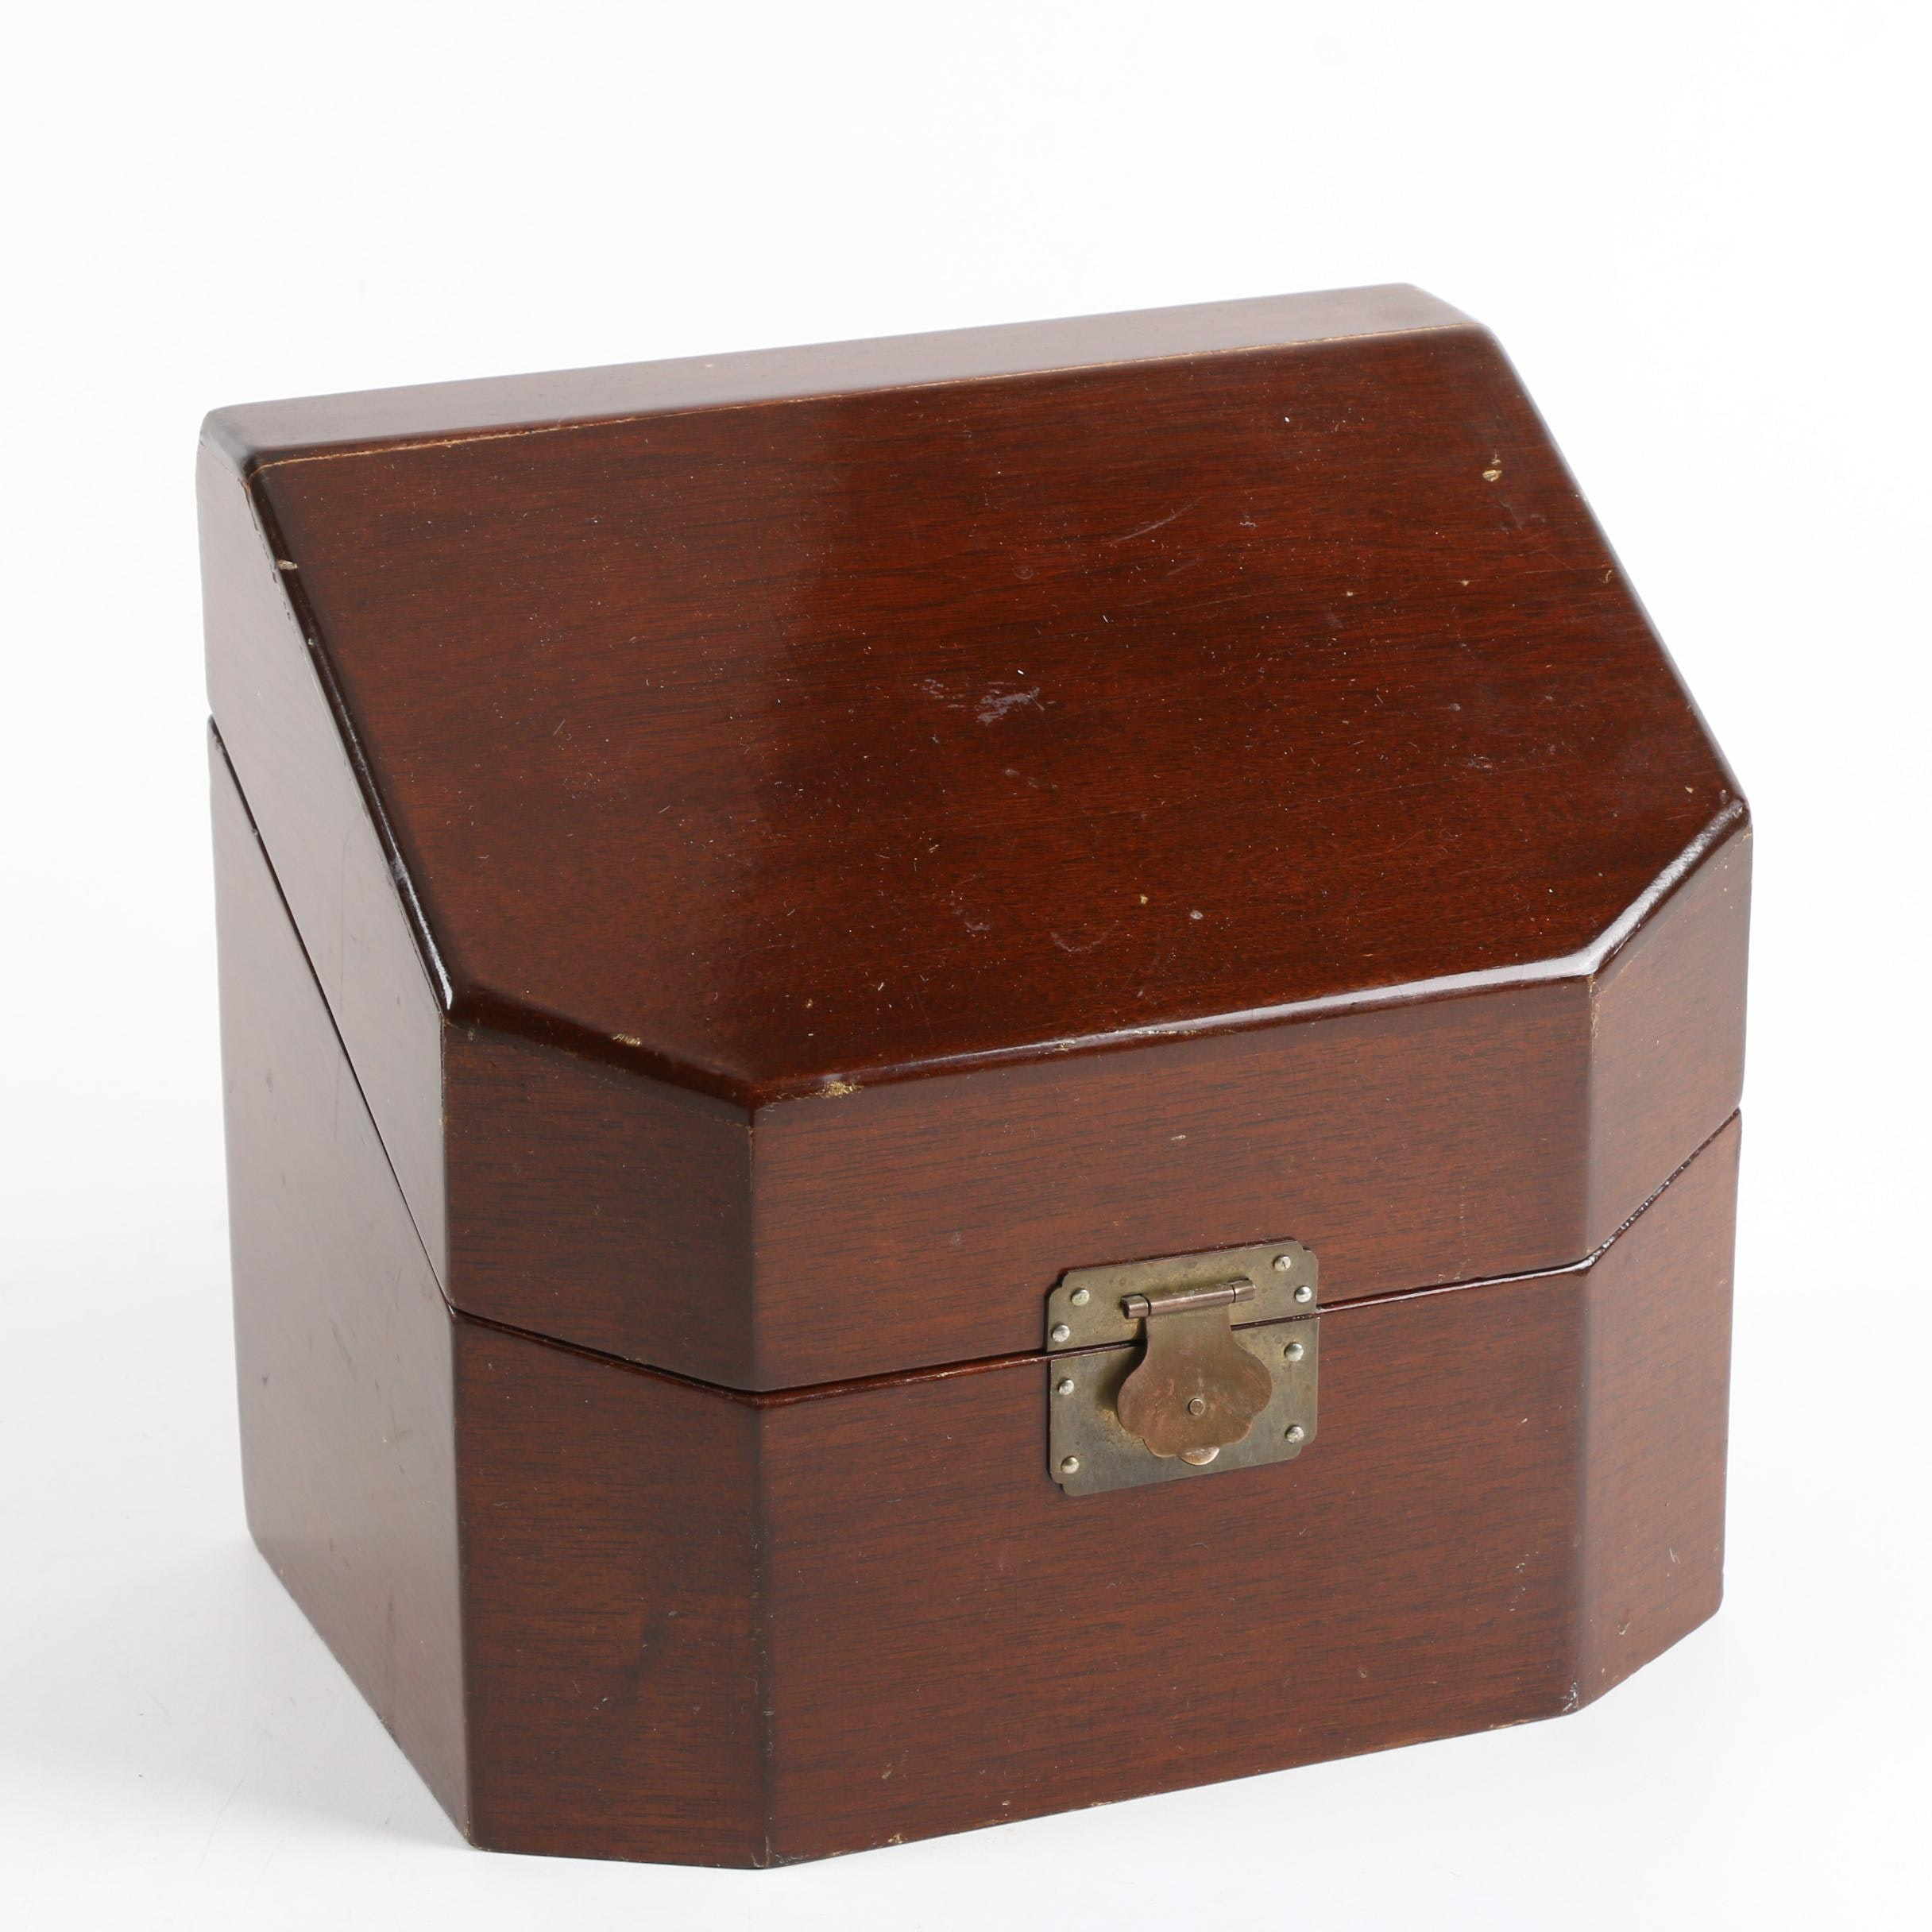 Wooden Trinket Box with Metal Closure